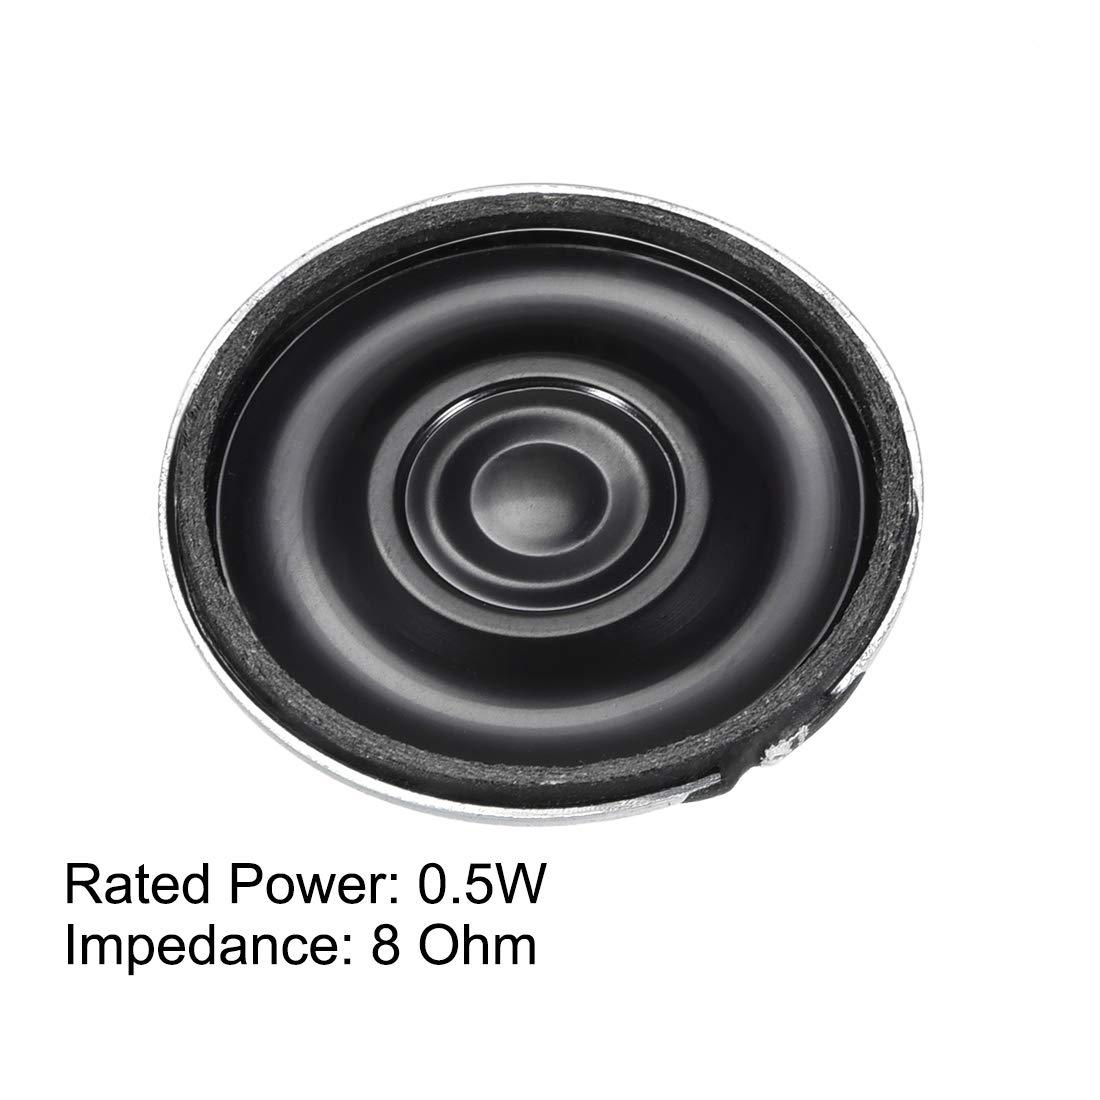 uxcell 0.5W 8 Ohm Audio Speaker Diameter 28mm Loudspeaker for Electronic Project 2pcs